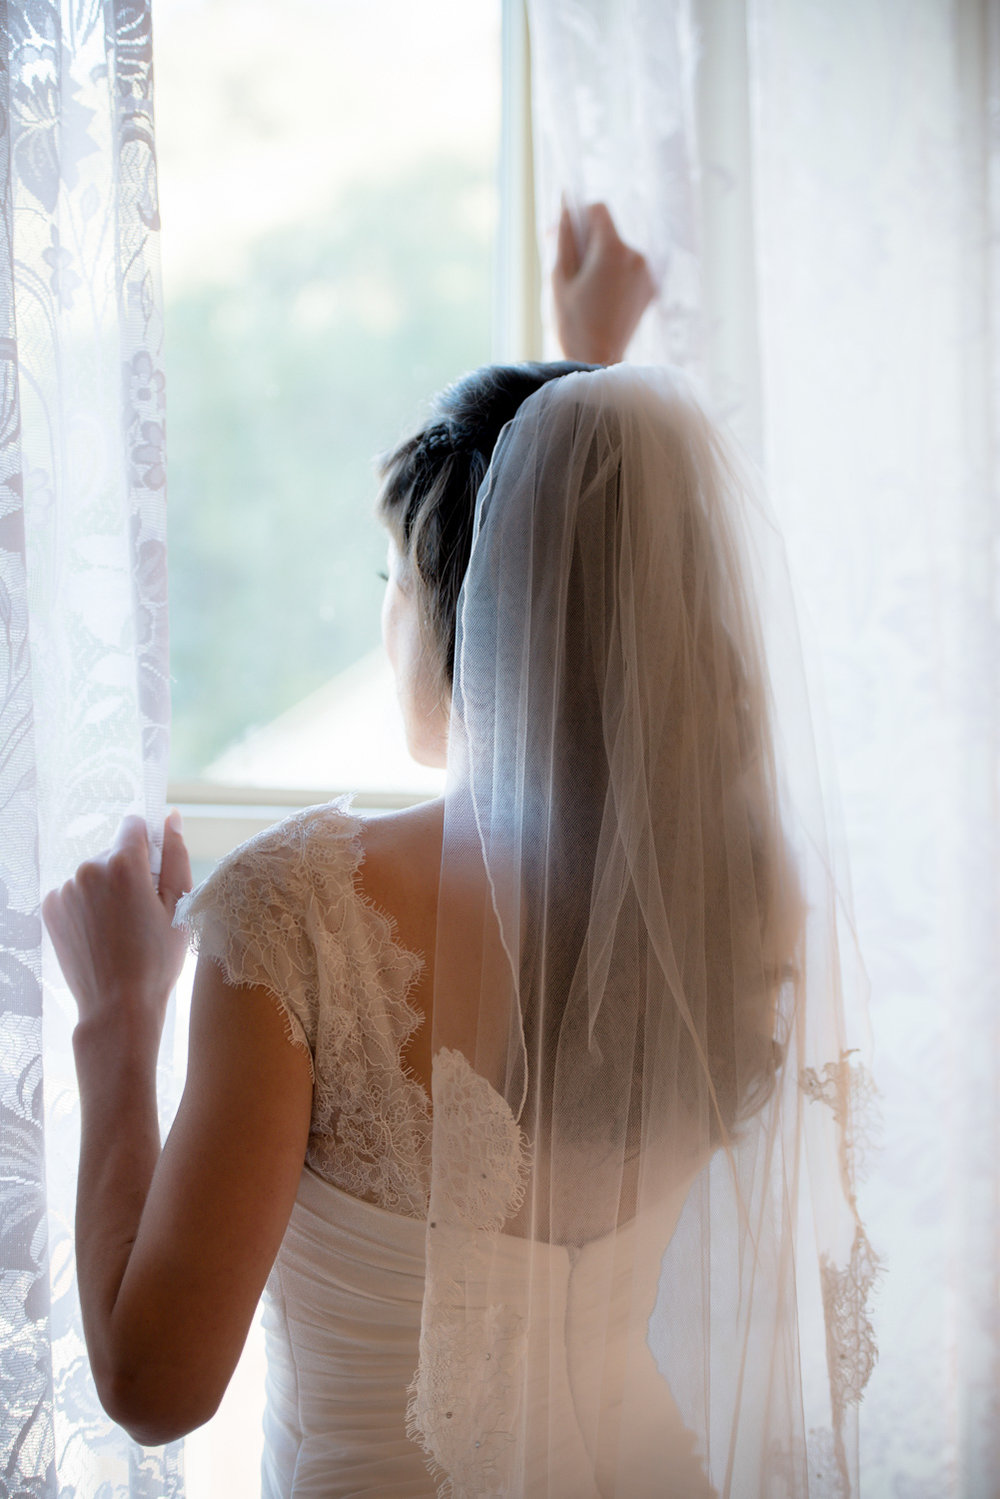 bride-window-bridesmaid-helping-bride-get-ready-elliston-vineyard-wedding-photographer-afewgood-clicks.net